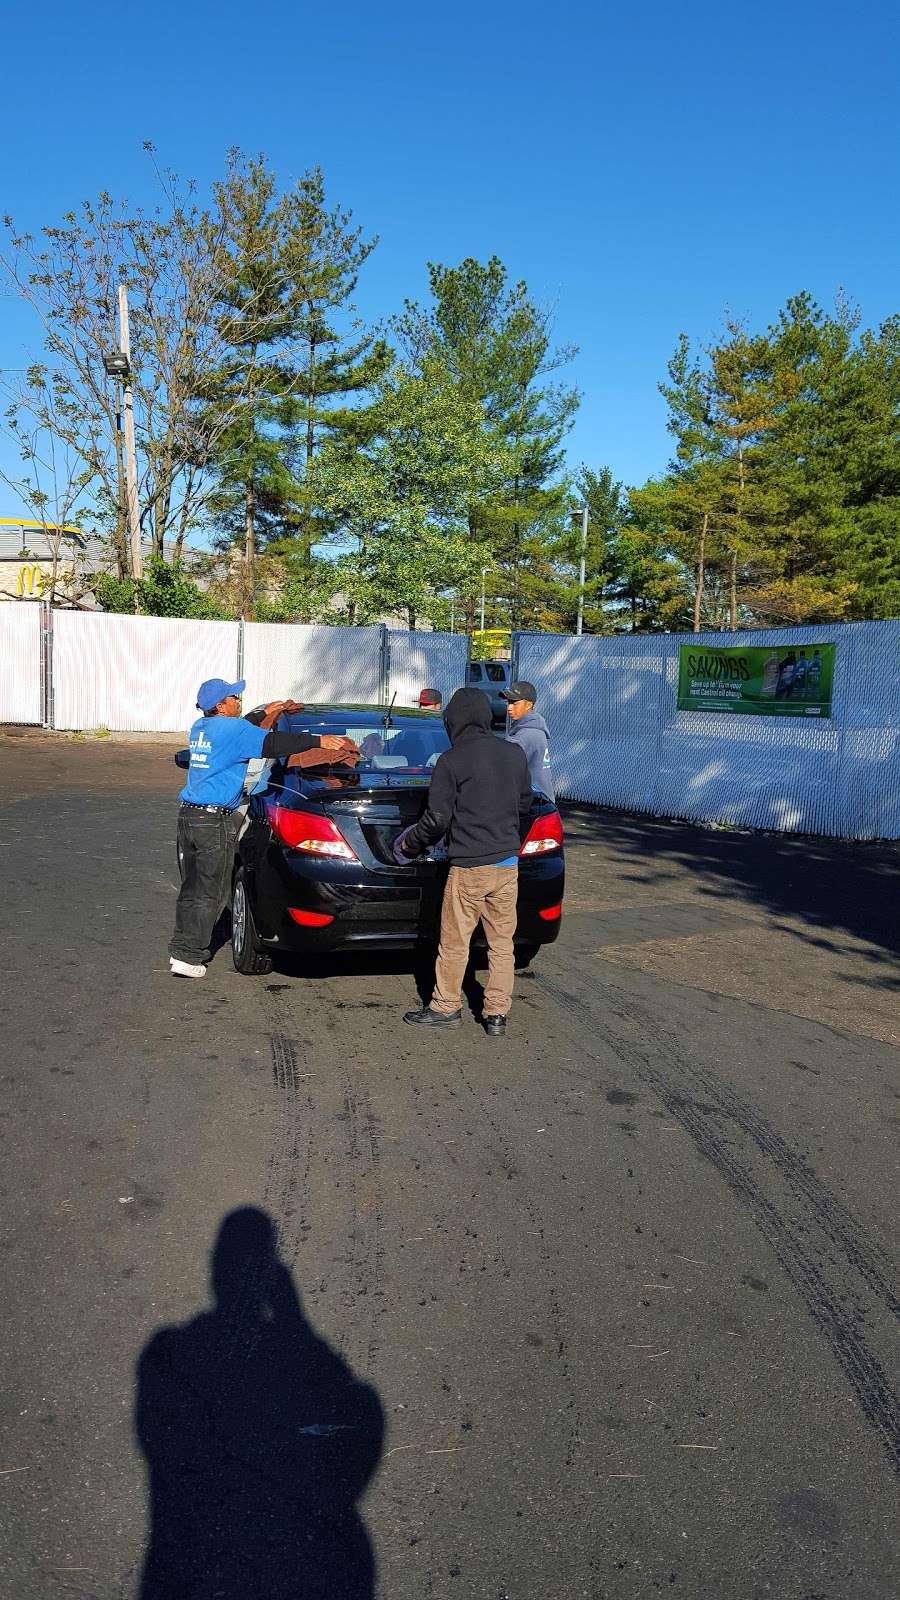 City Line Car Wash - car wash  | Photo 9 of 10 | Address: 1505 John F Kennedy Boulevard, 149 w 63RD St Bayonne NJ 07002, Jersey City, NJ 07305, USA | Phone: (201) 434-3355